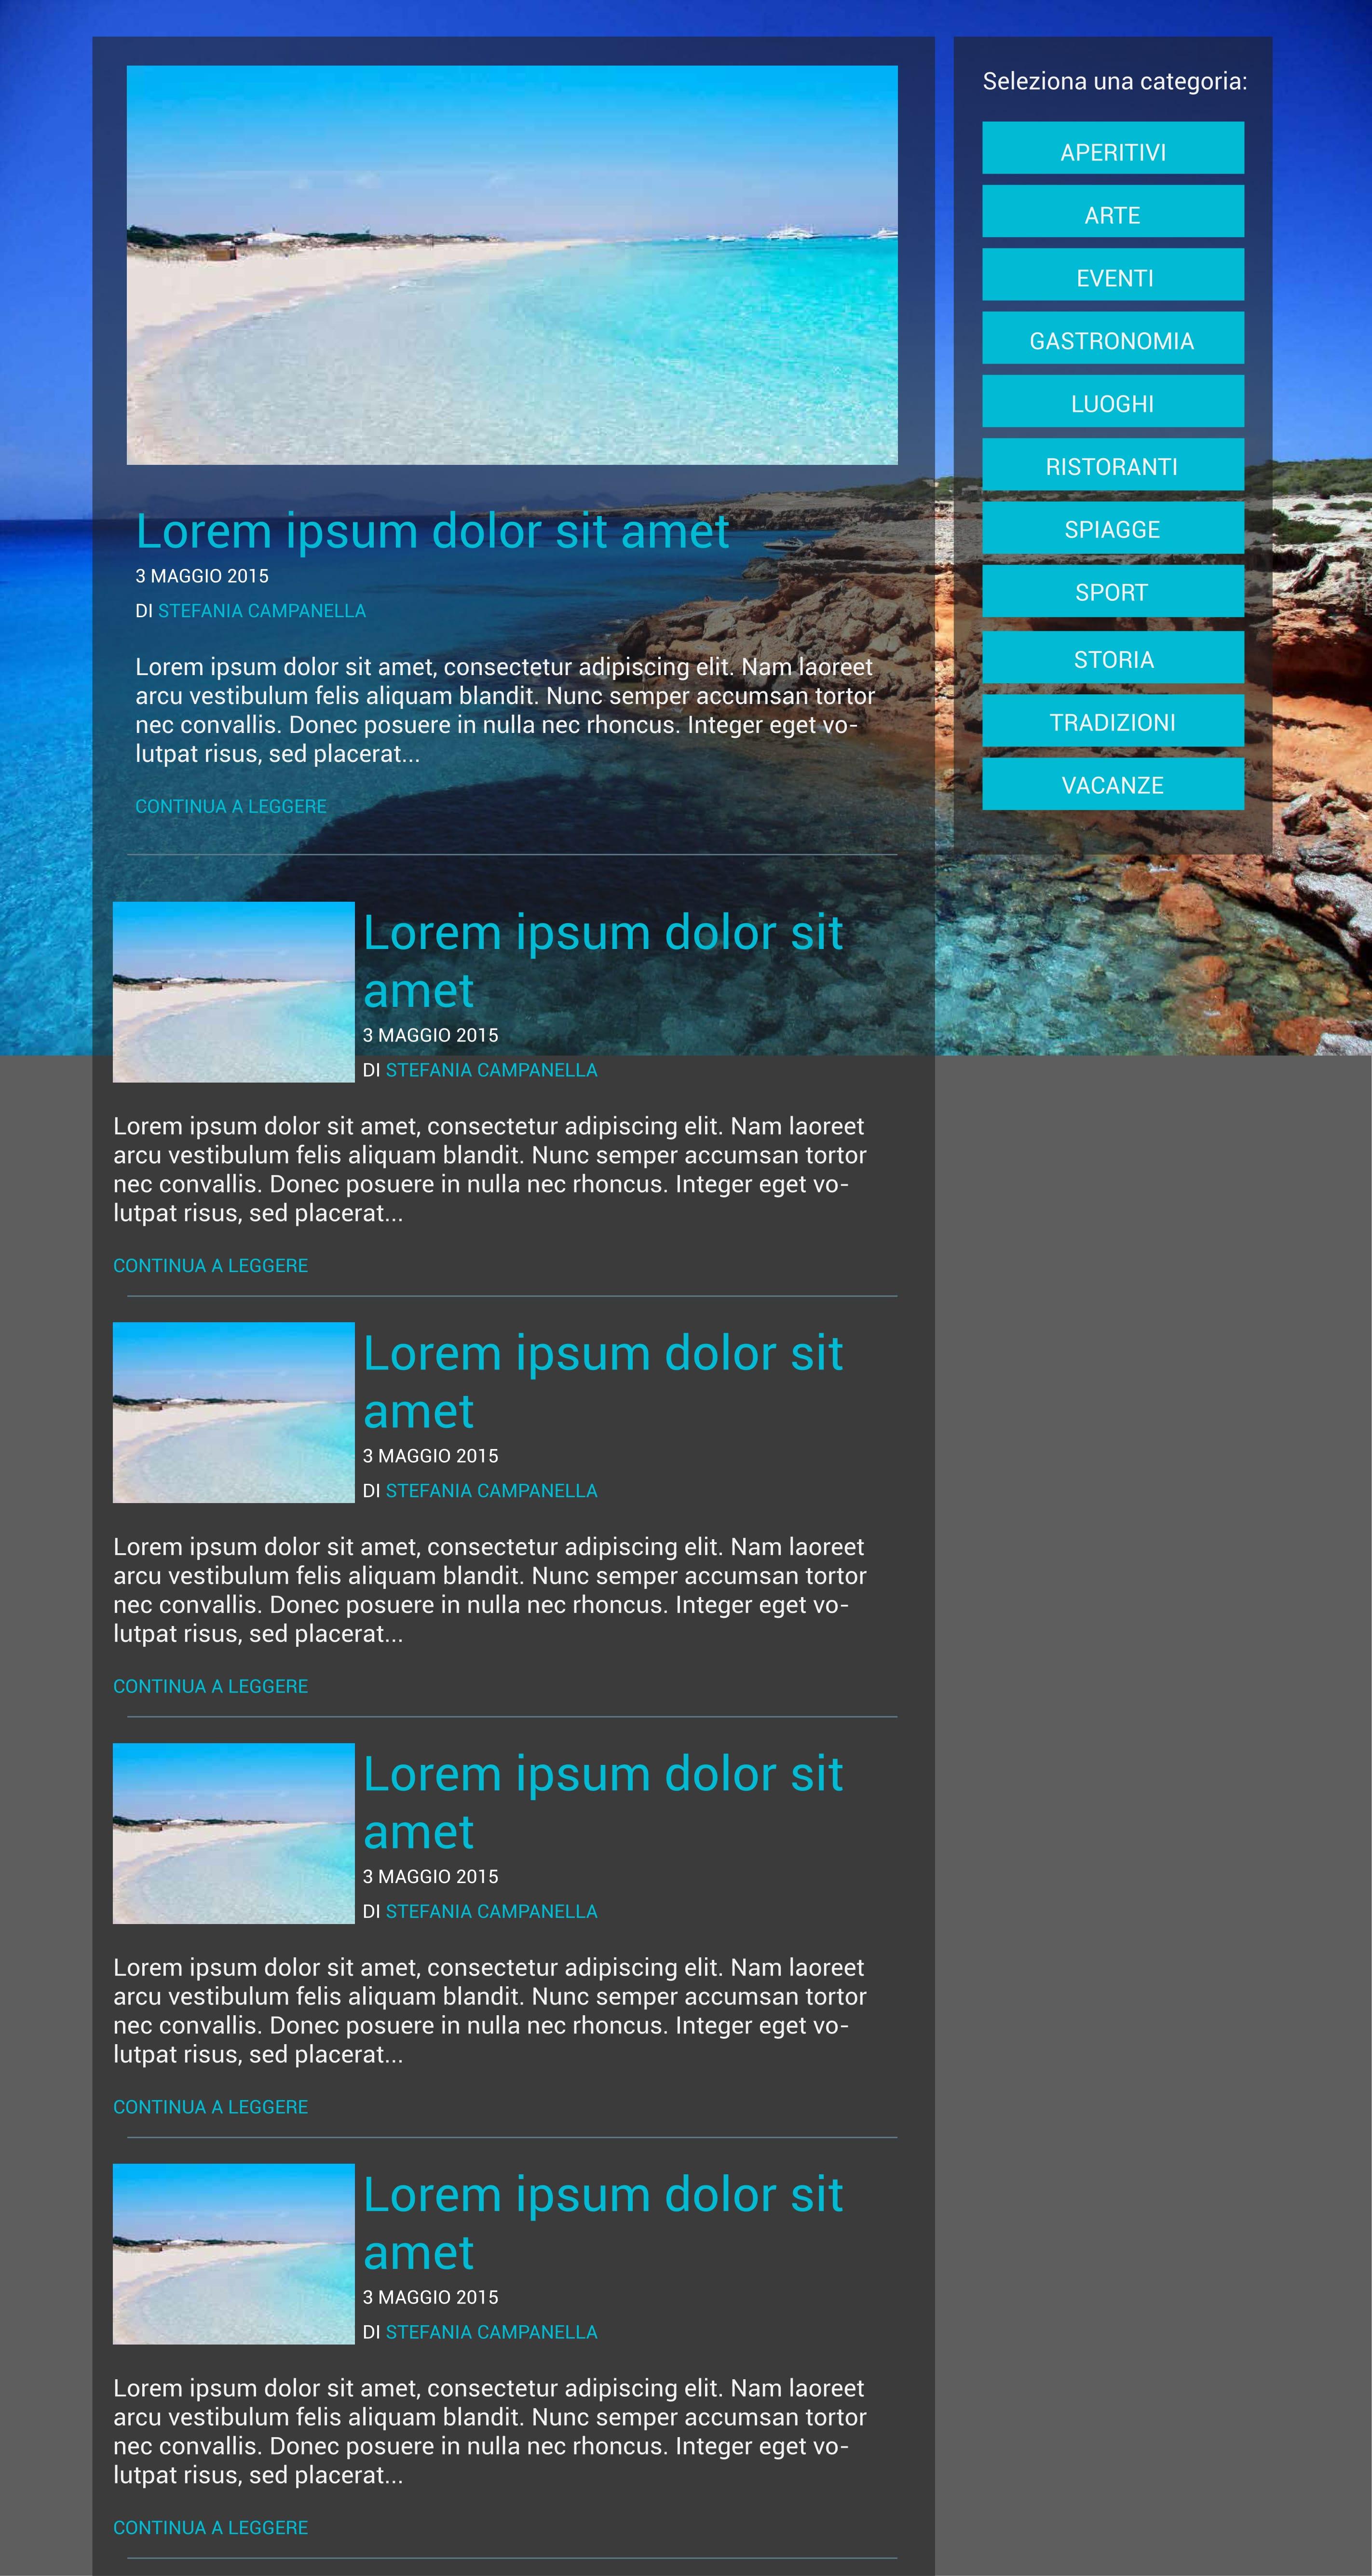 Formentera blog list articles 4